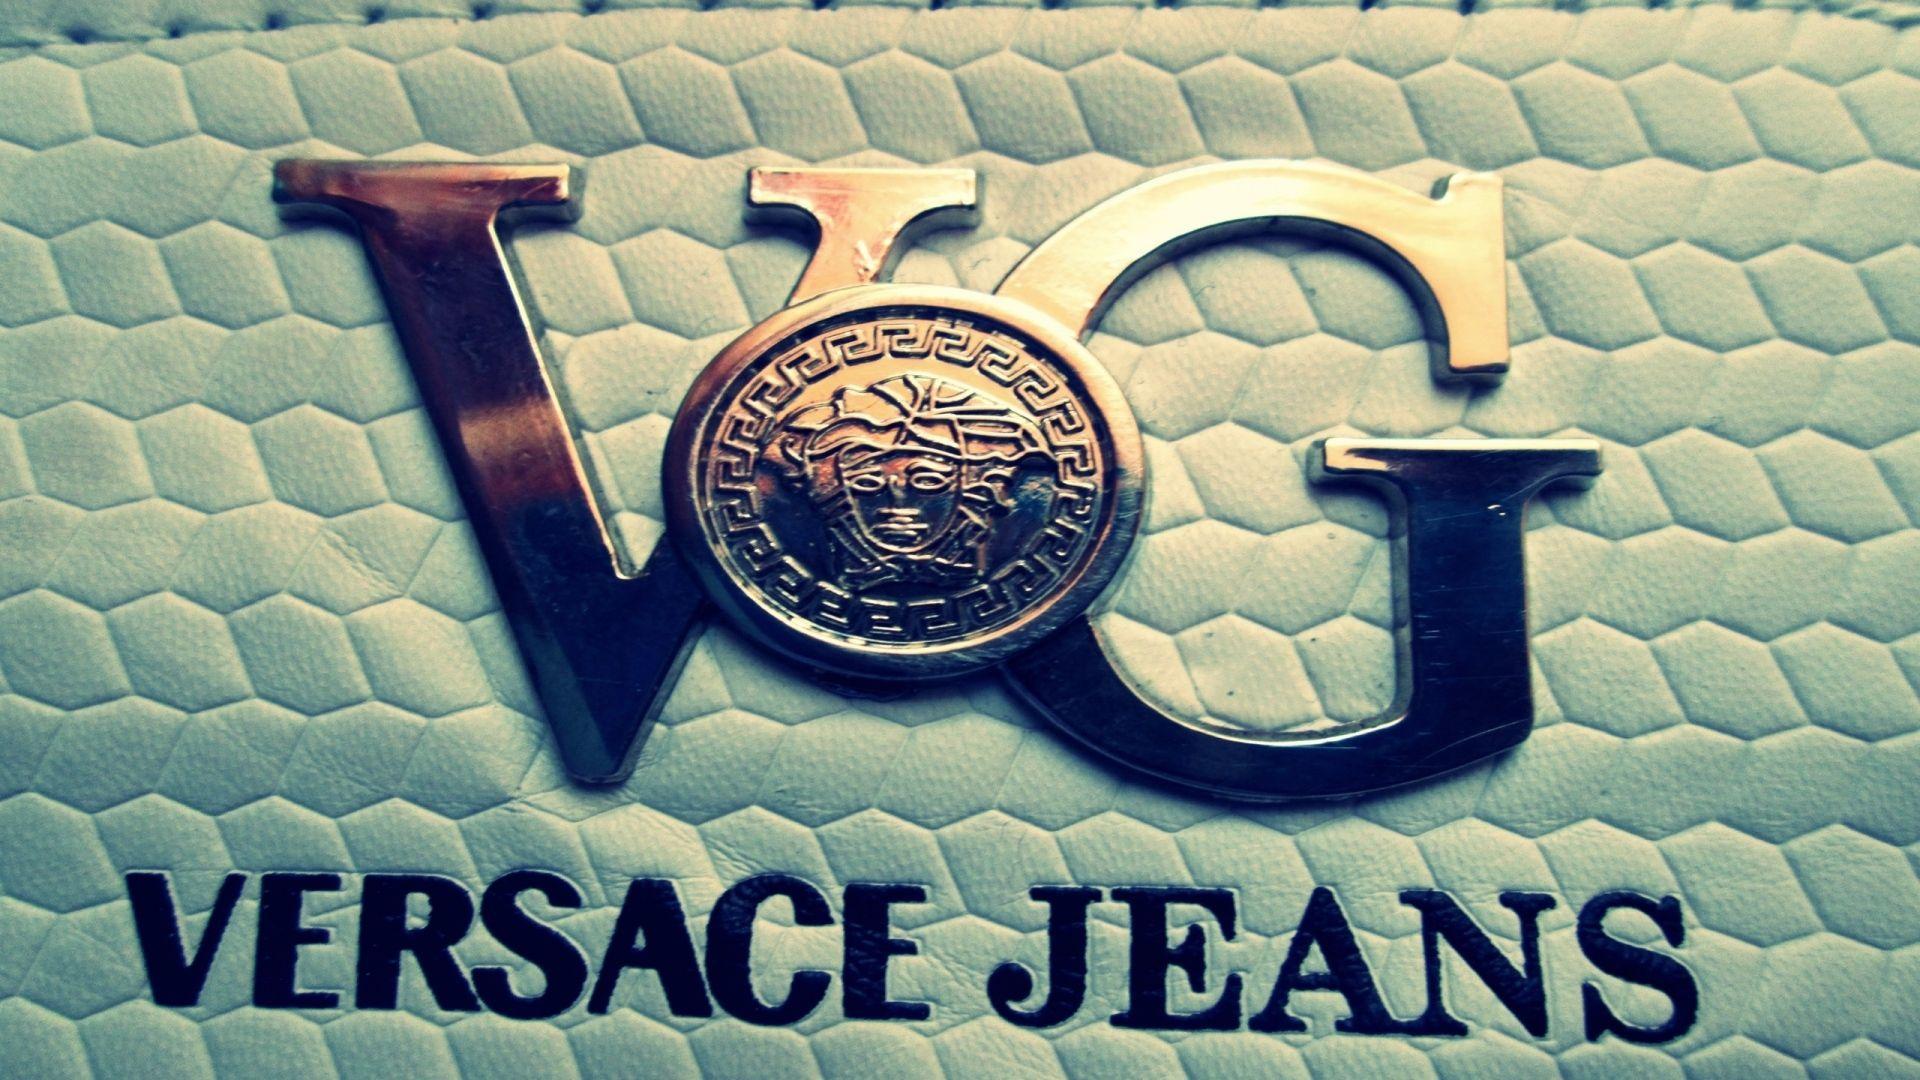 Versace Wallpapers Wallpaper Cave HD Wallpapers Download Free Images Wallpaper [1000image.com]